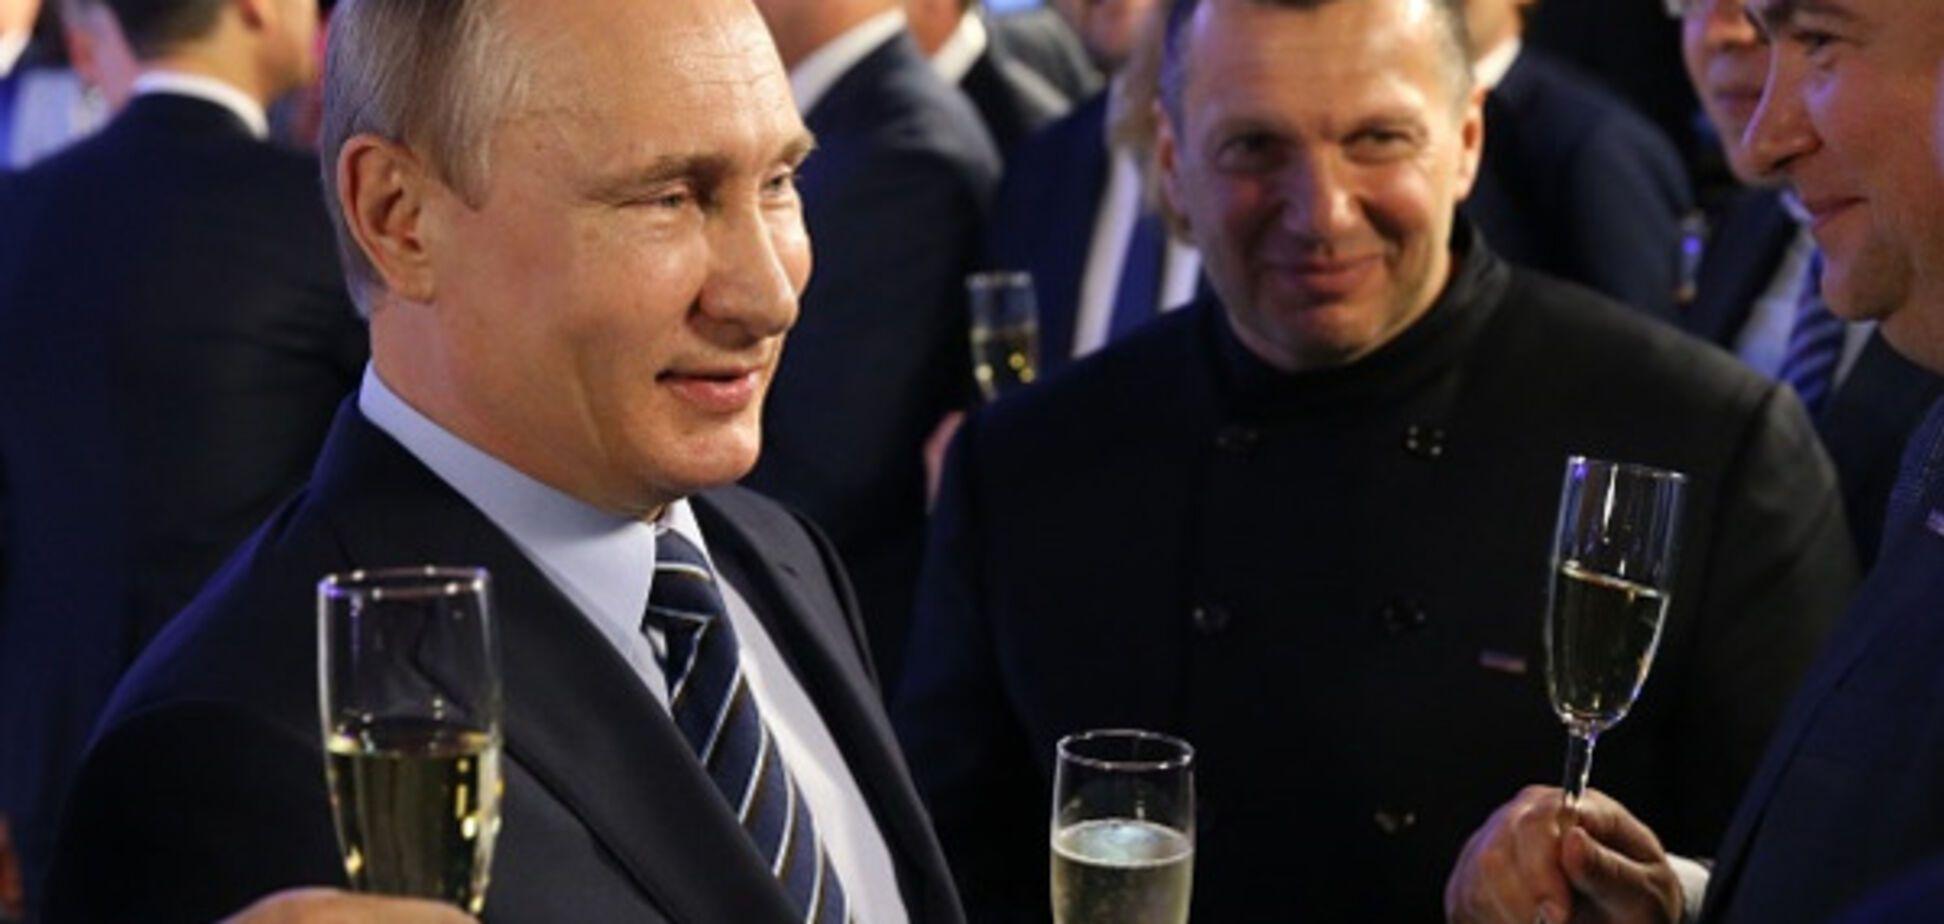 Владимир Путин и Владимир Соловьев